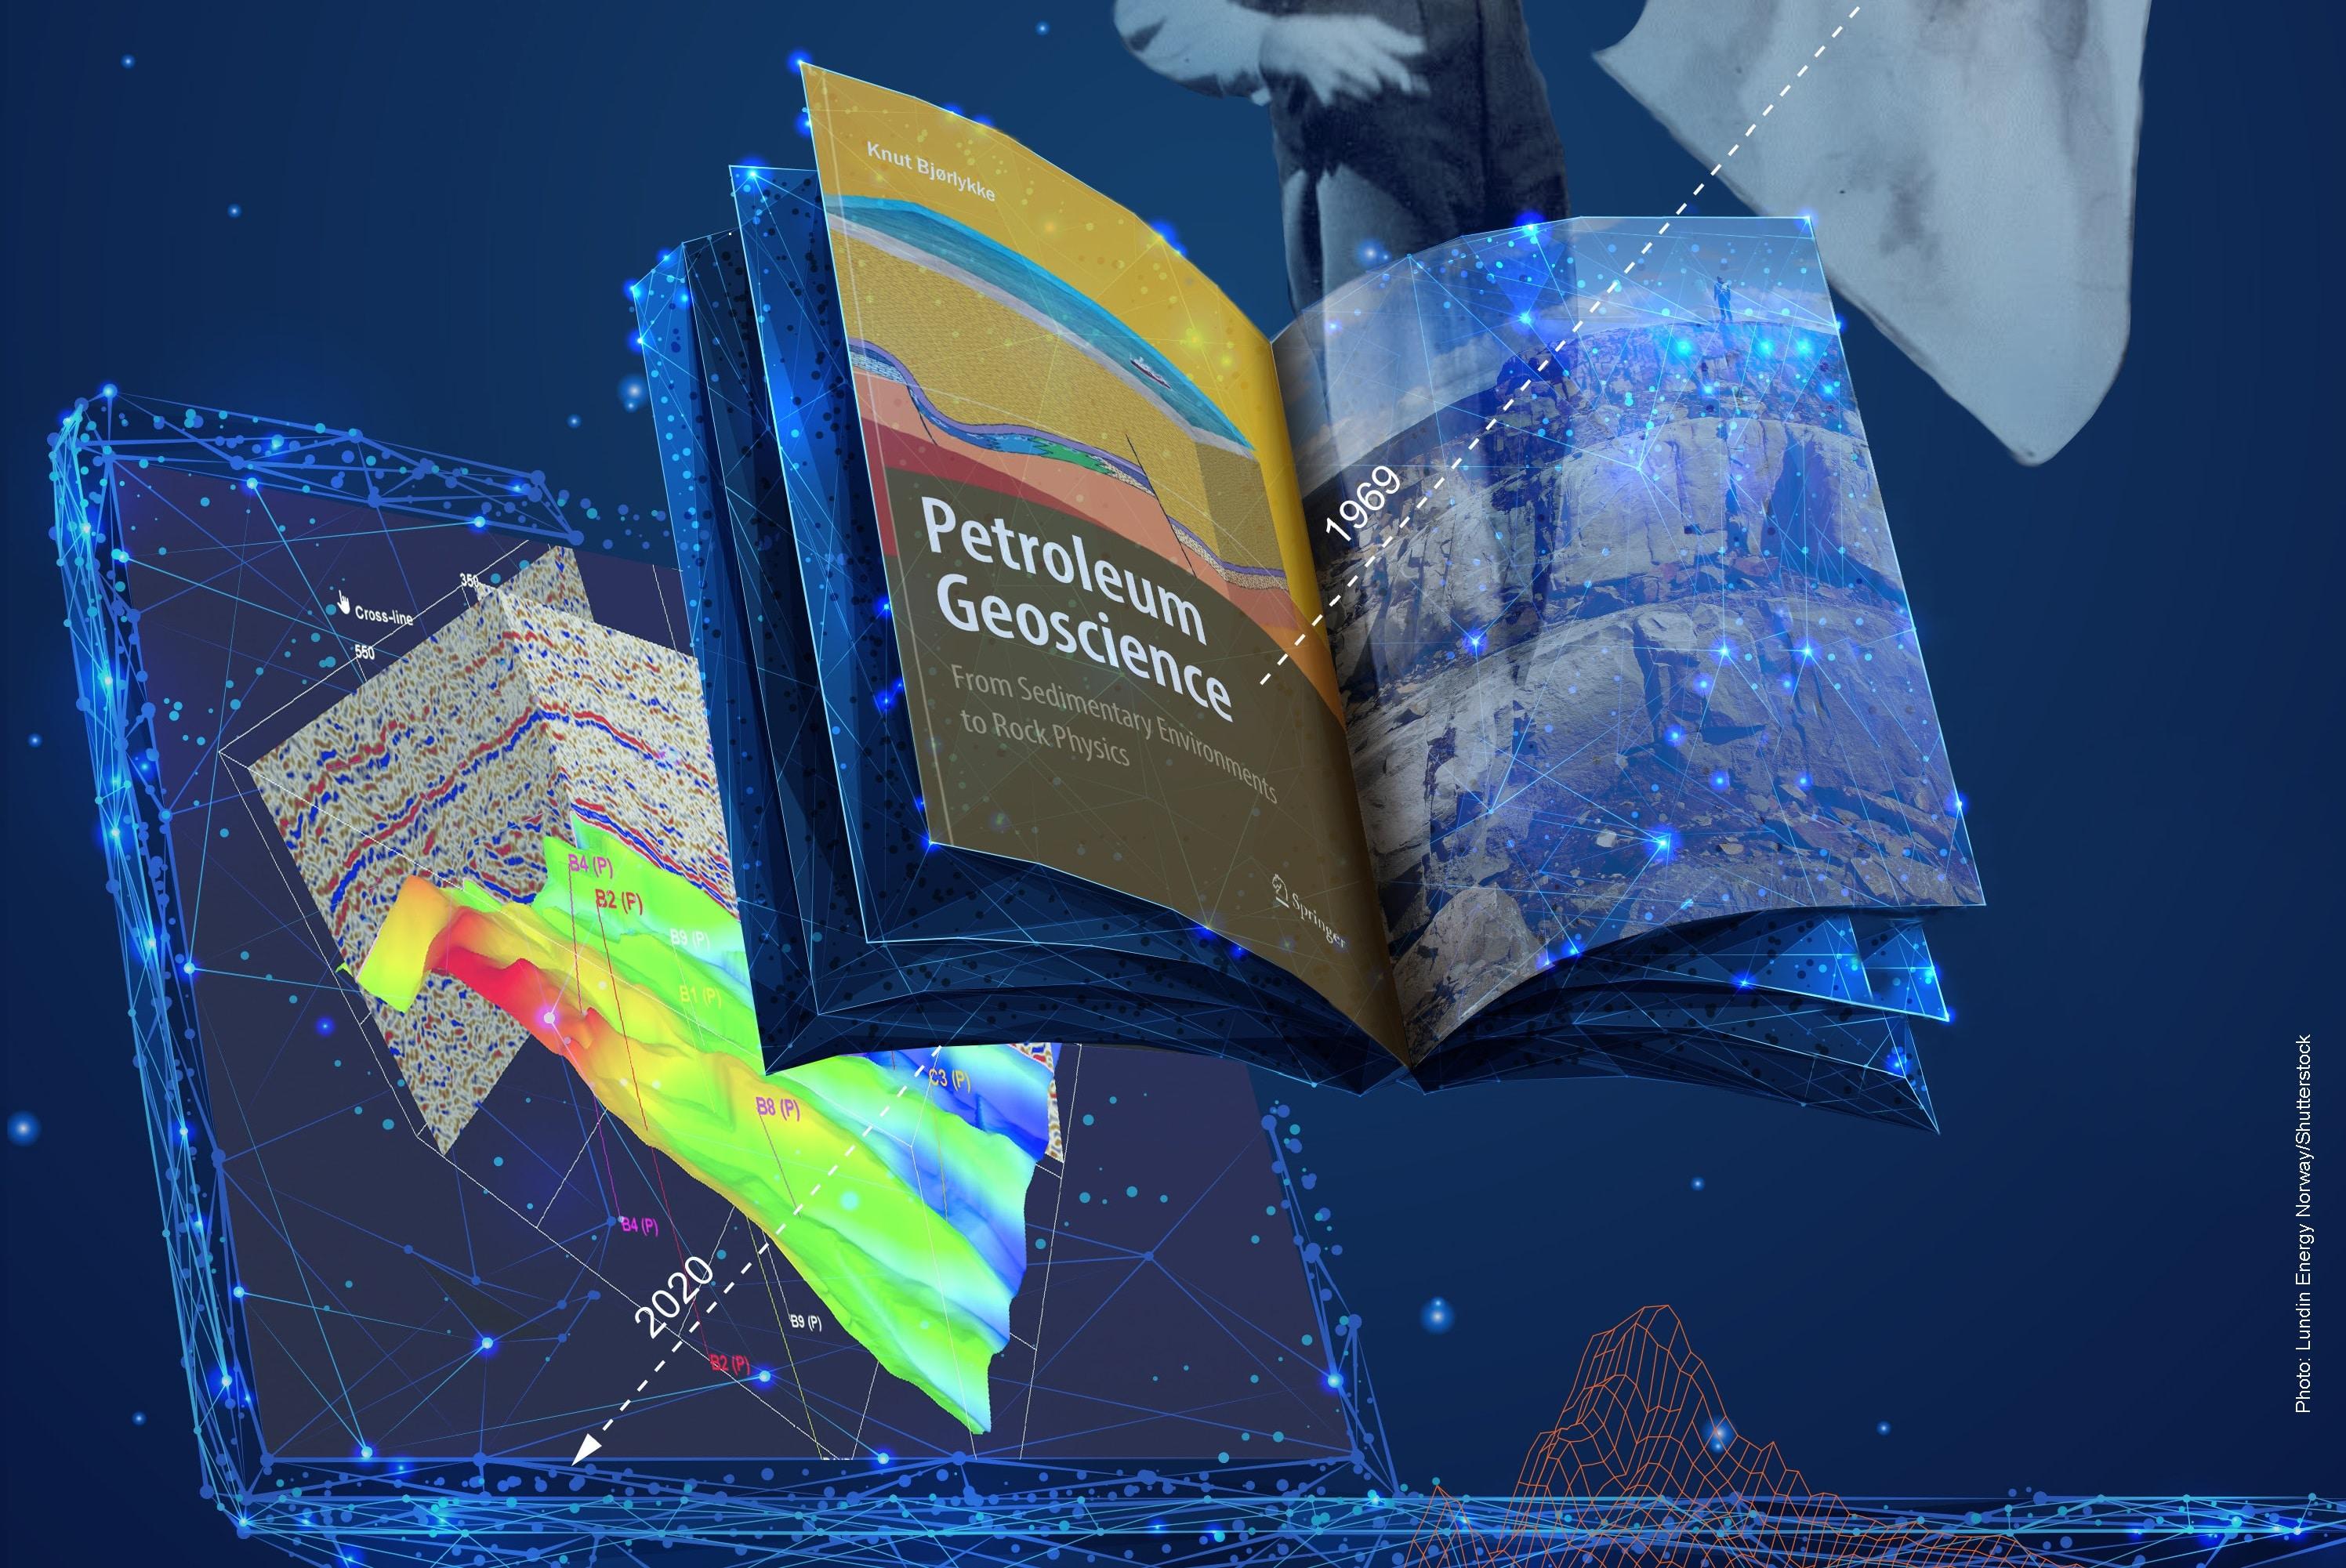 Production Geoscience 2020